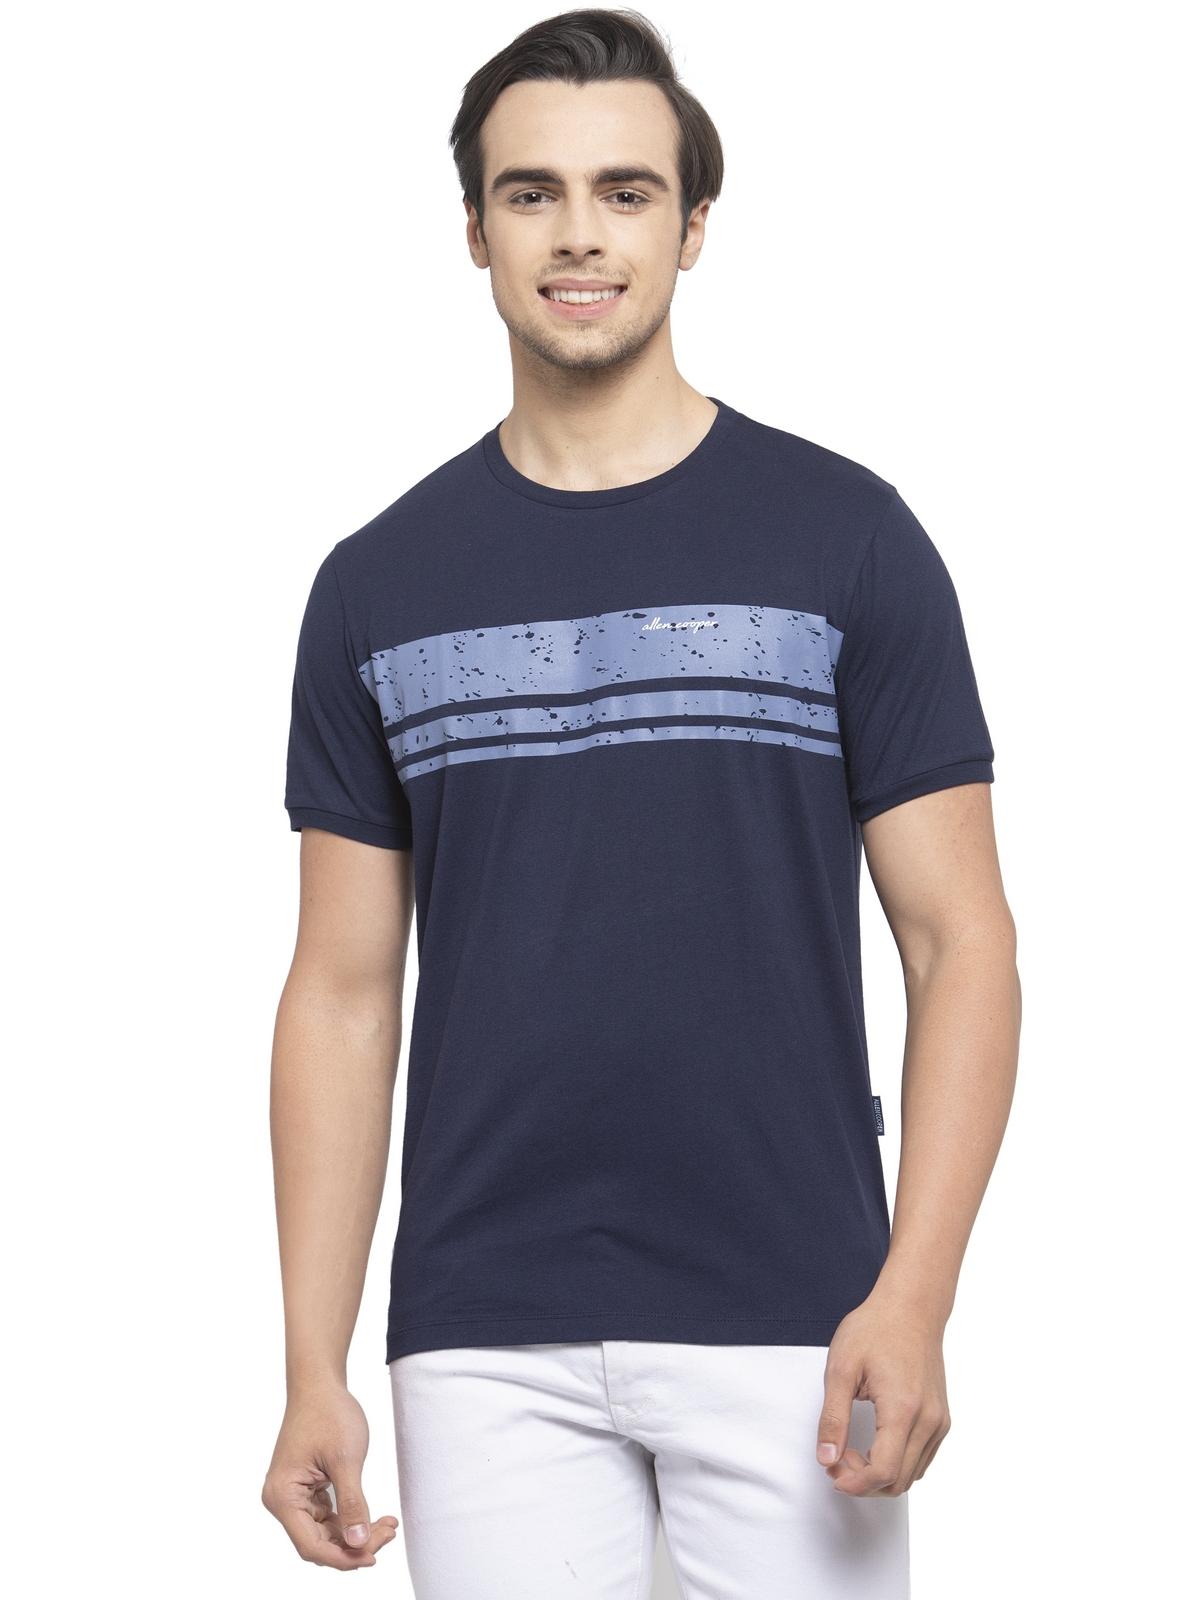 Allen Cooper   Allen Cooper Navy Blue Regular Fit Round Neck T Shirts  For Men